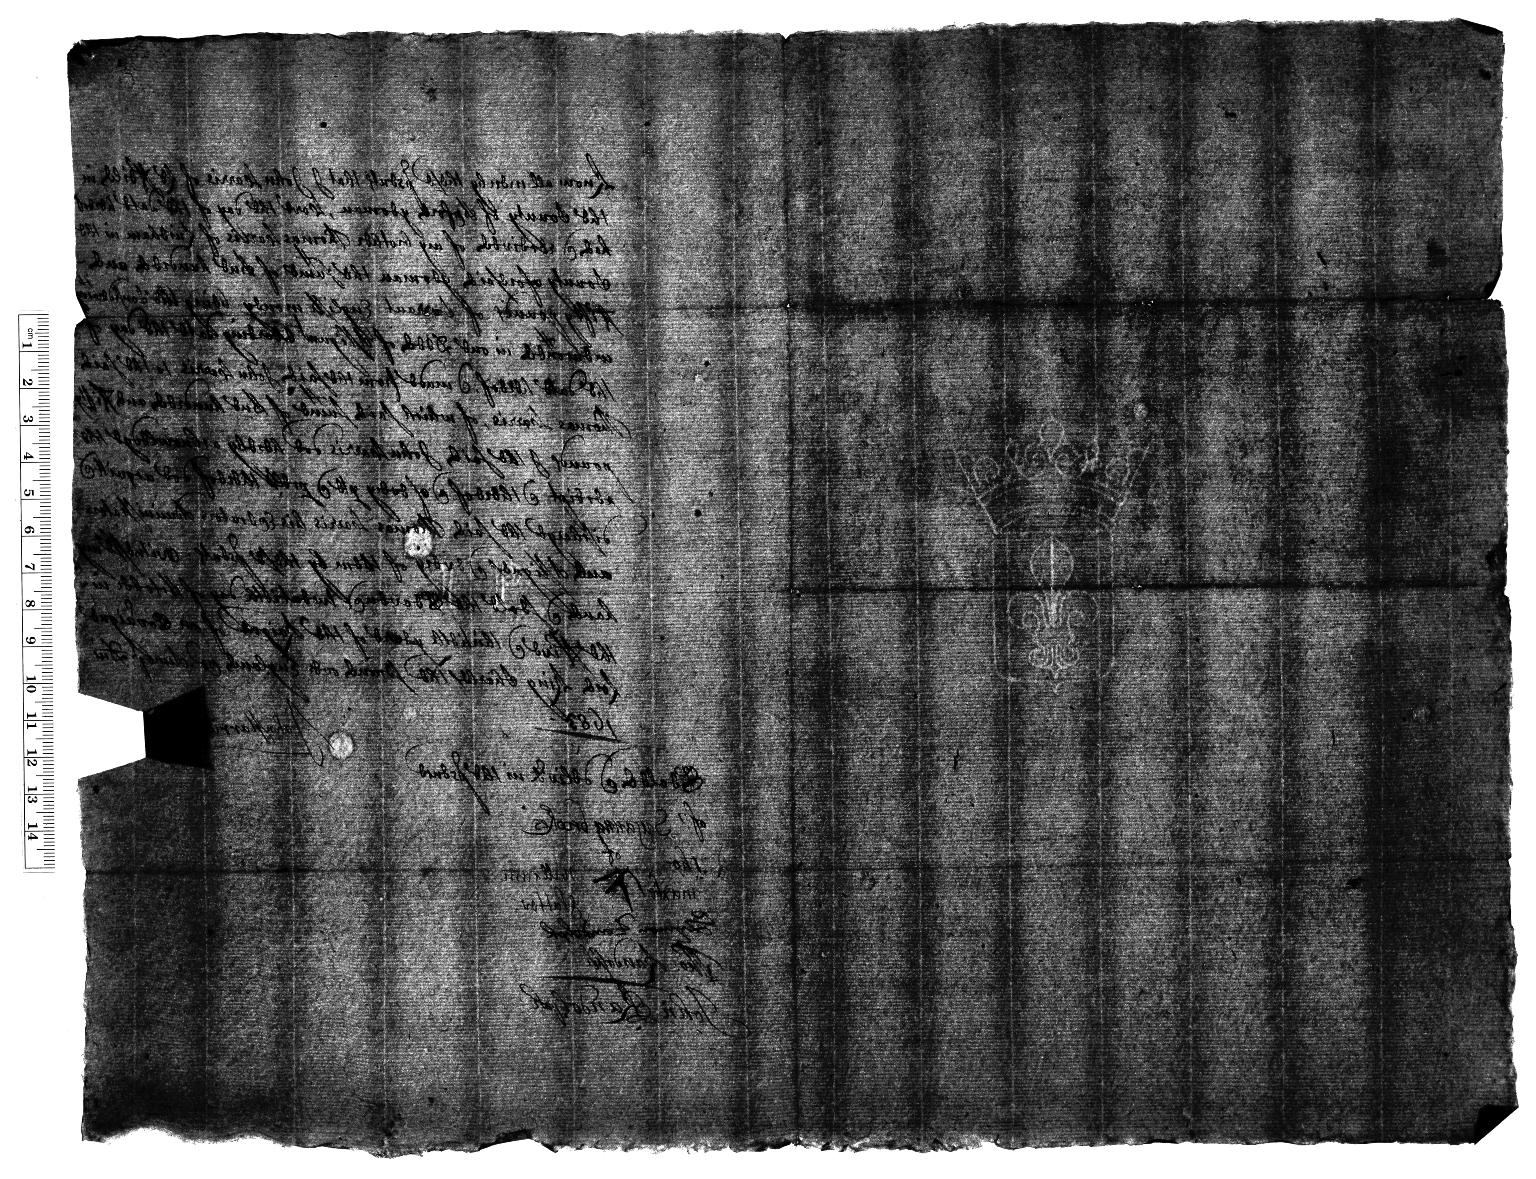 Acquittance from John Harris of Leafield, Oxfordshire, to Thomas Harris of Lindham, Oxfordshire